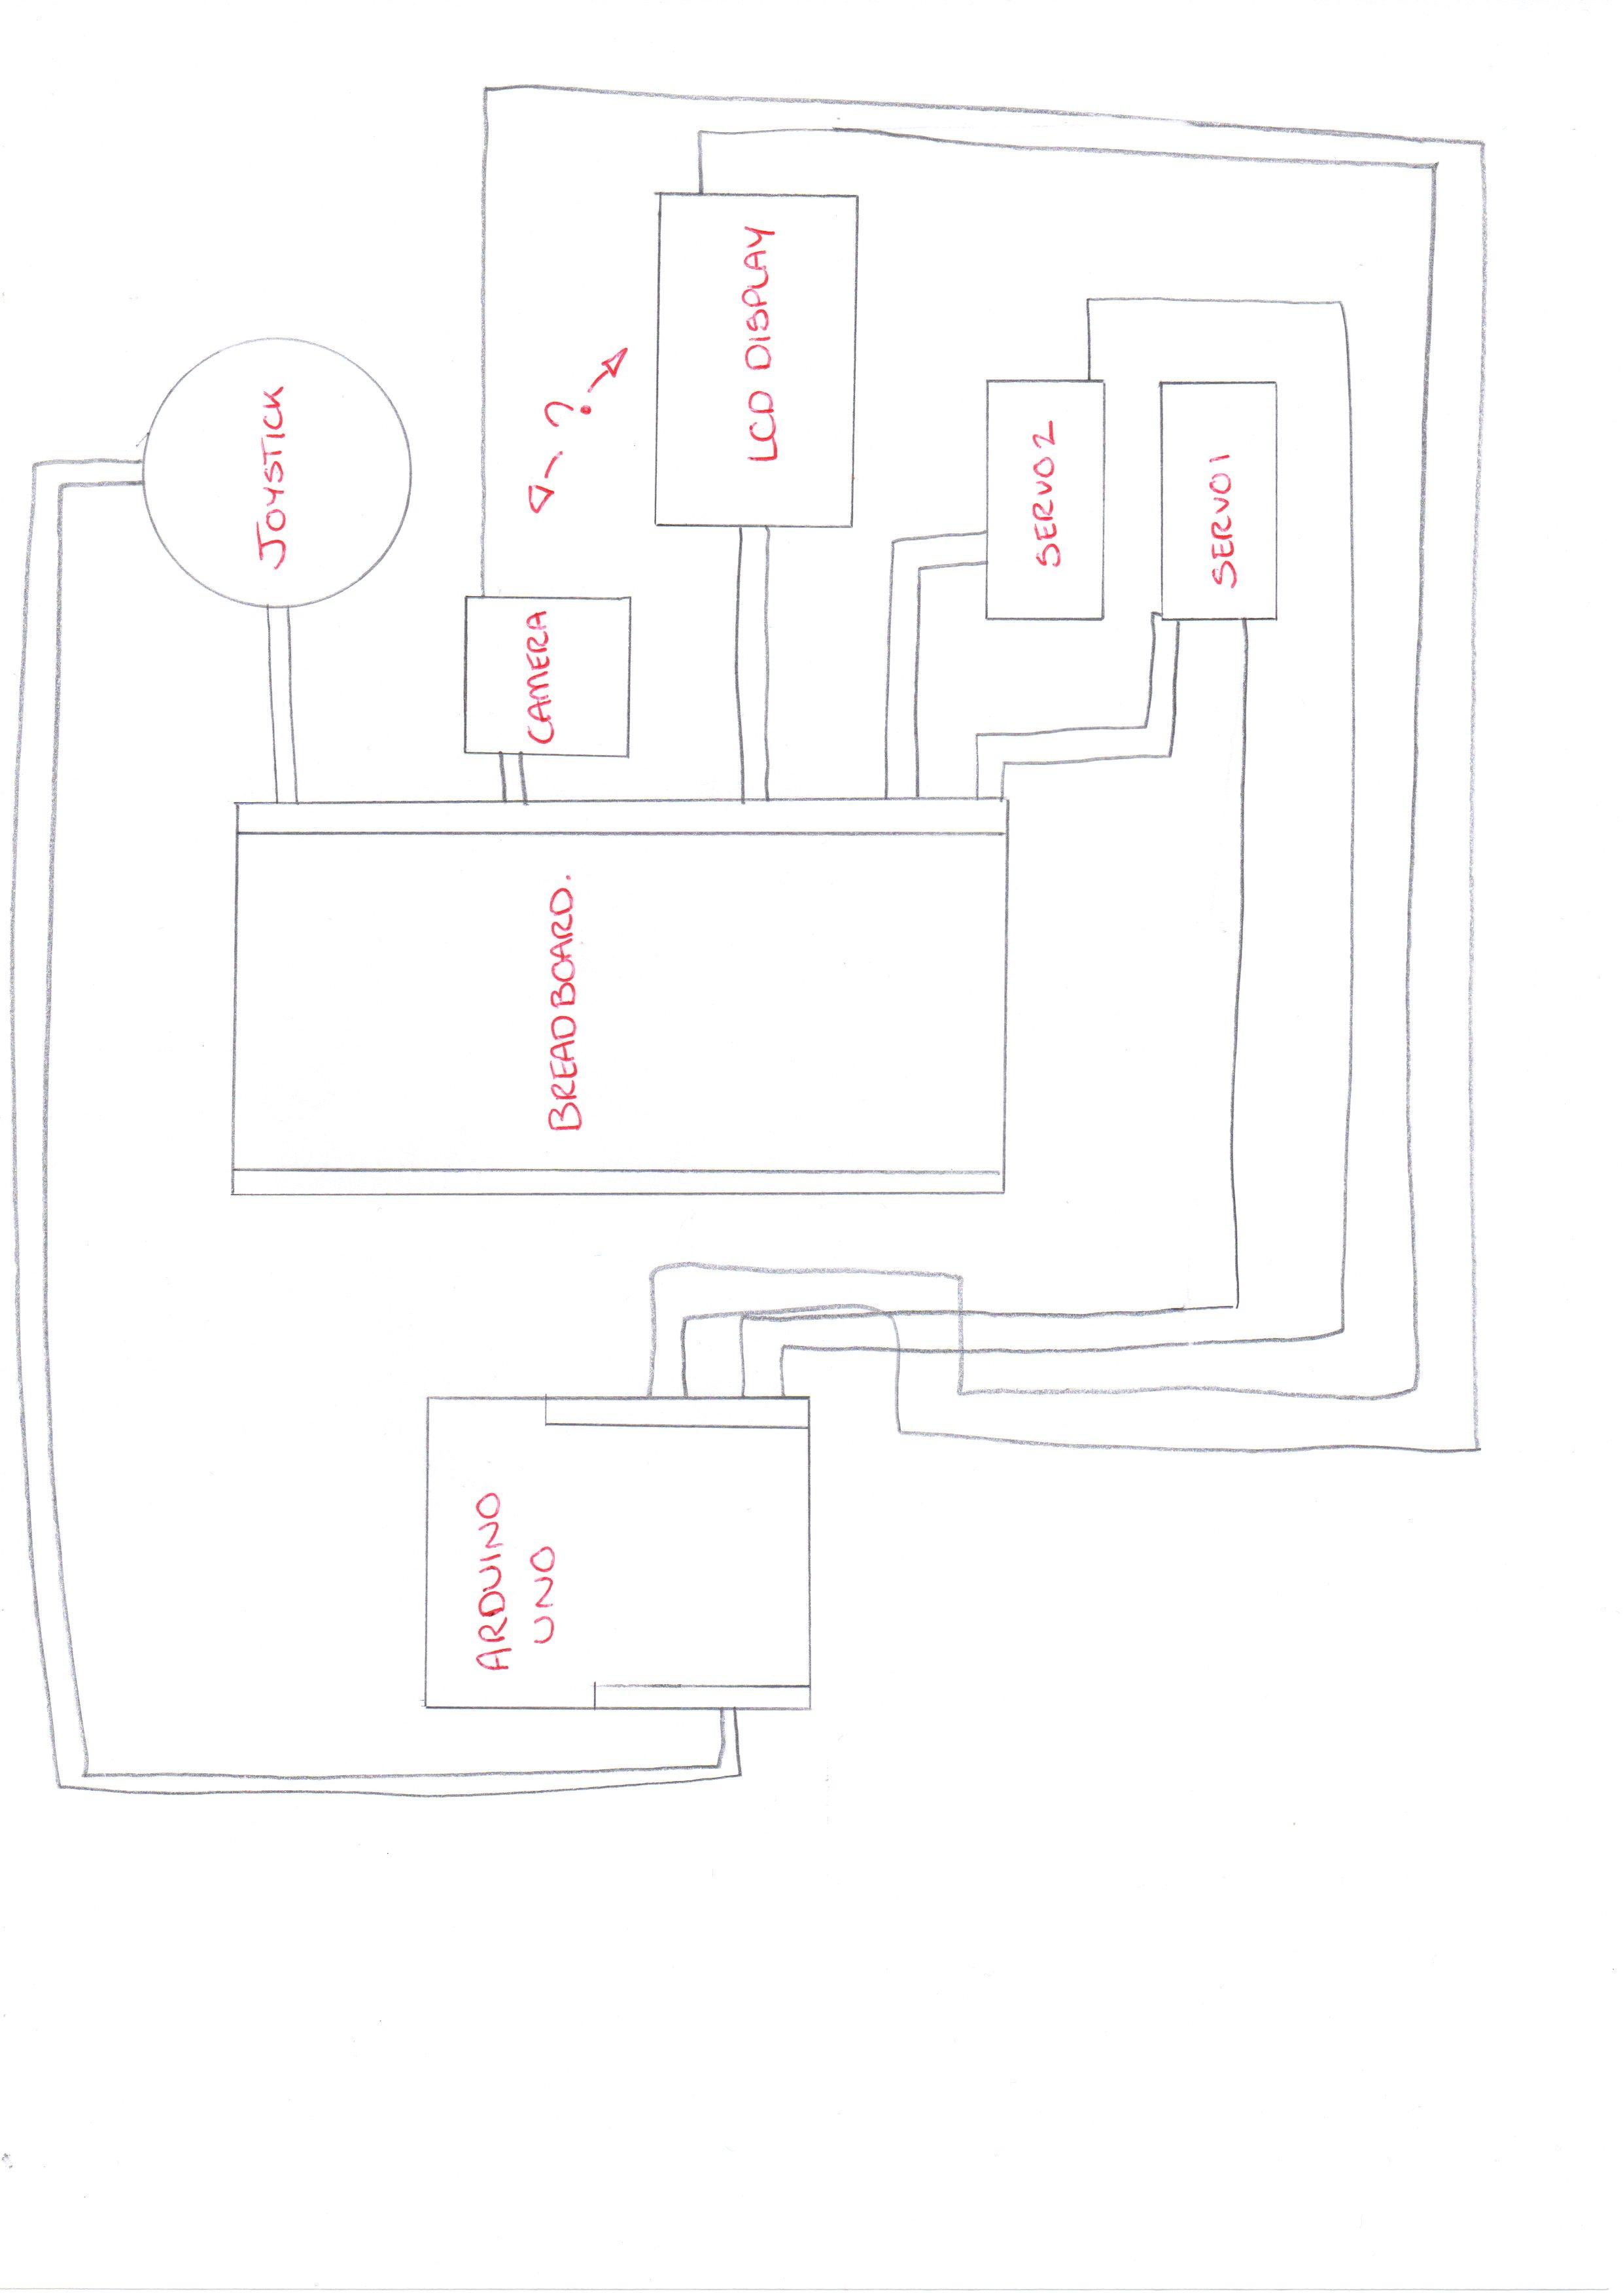 Project 2 Lcd Tft Screen Camera Module Ov Uwe